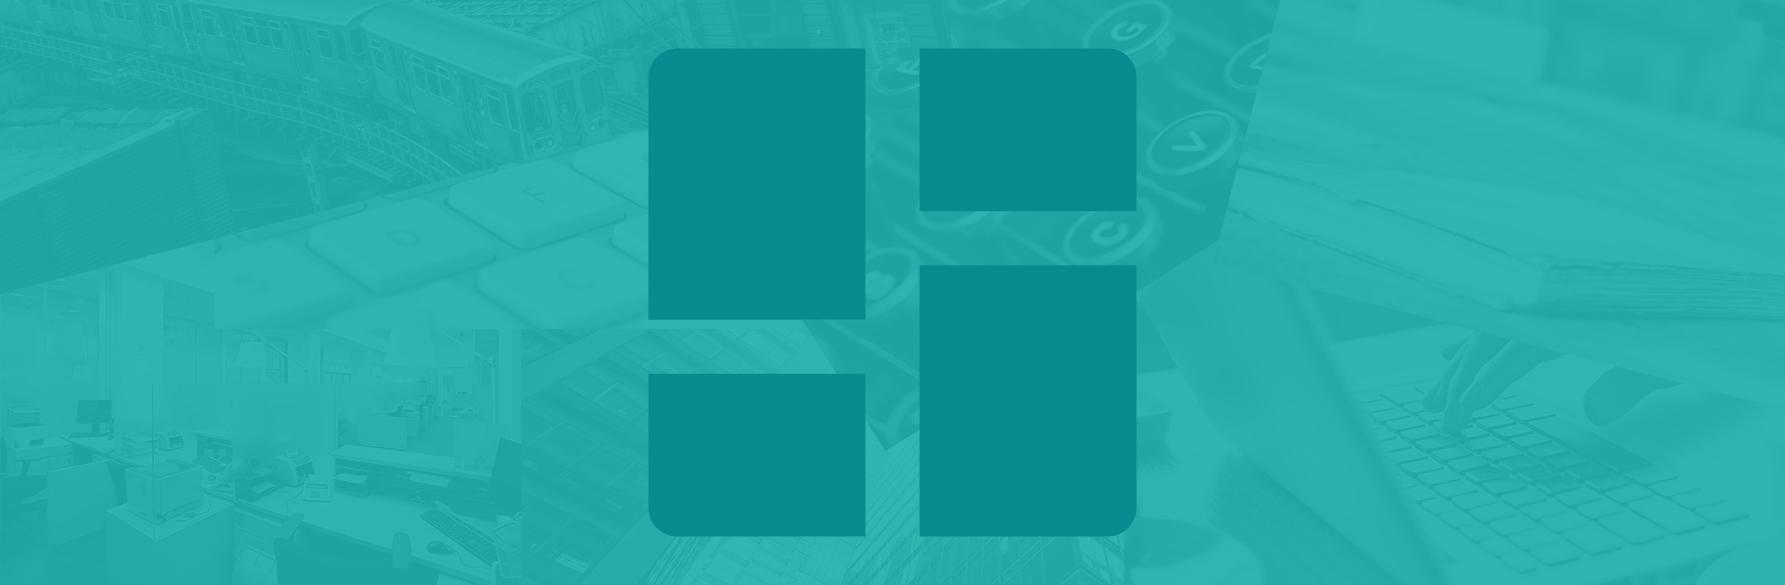 YY_YYSite_ServicesHero_Graphic Design